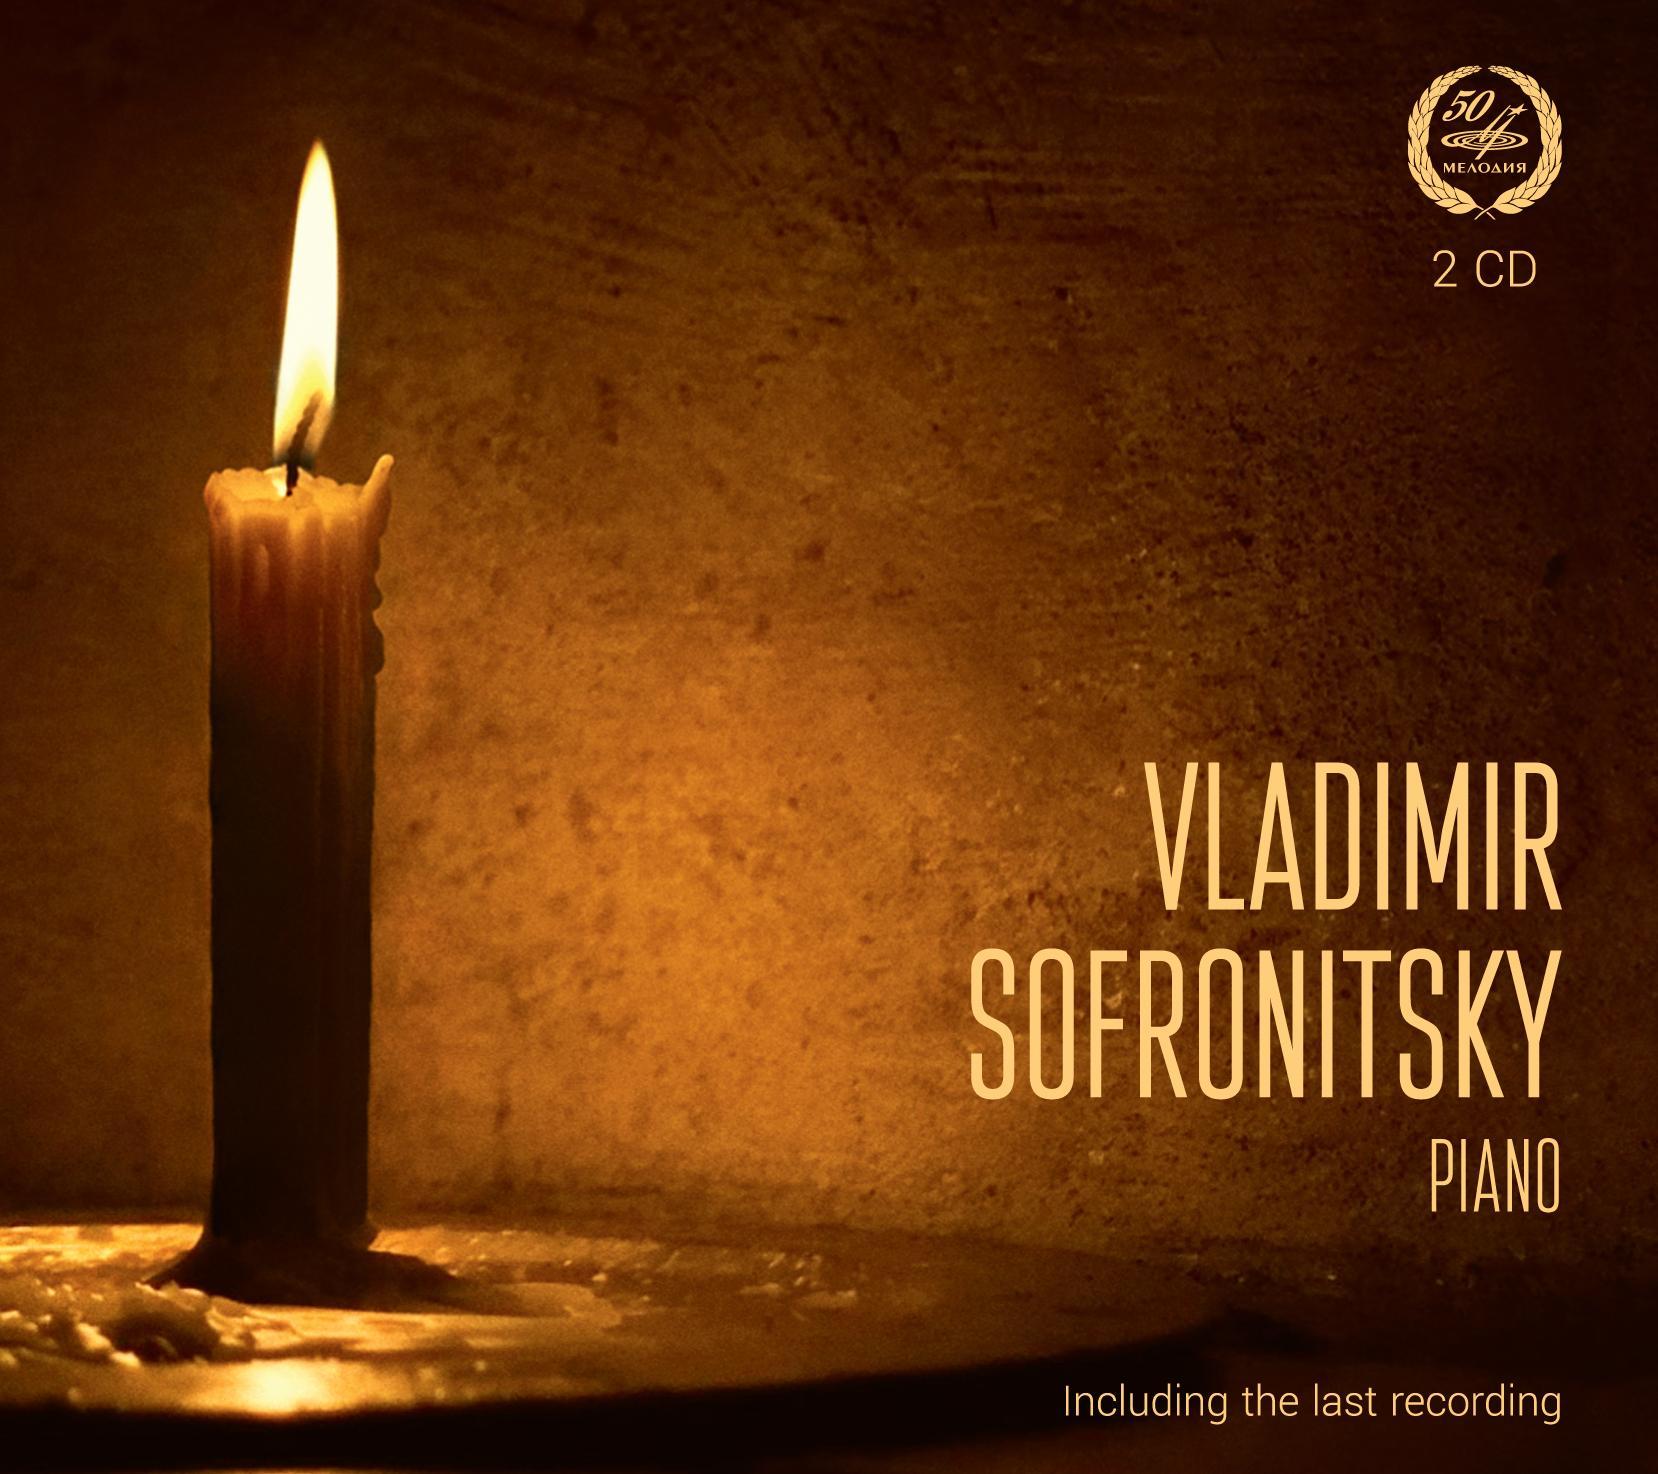 Vladimir Sofronitsky - Page 3 7836c14e9c7cfdc34107052858287ae0